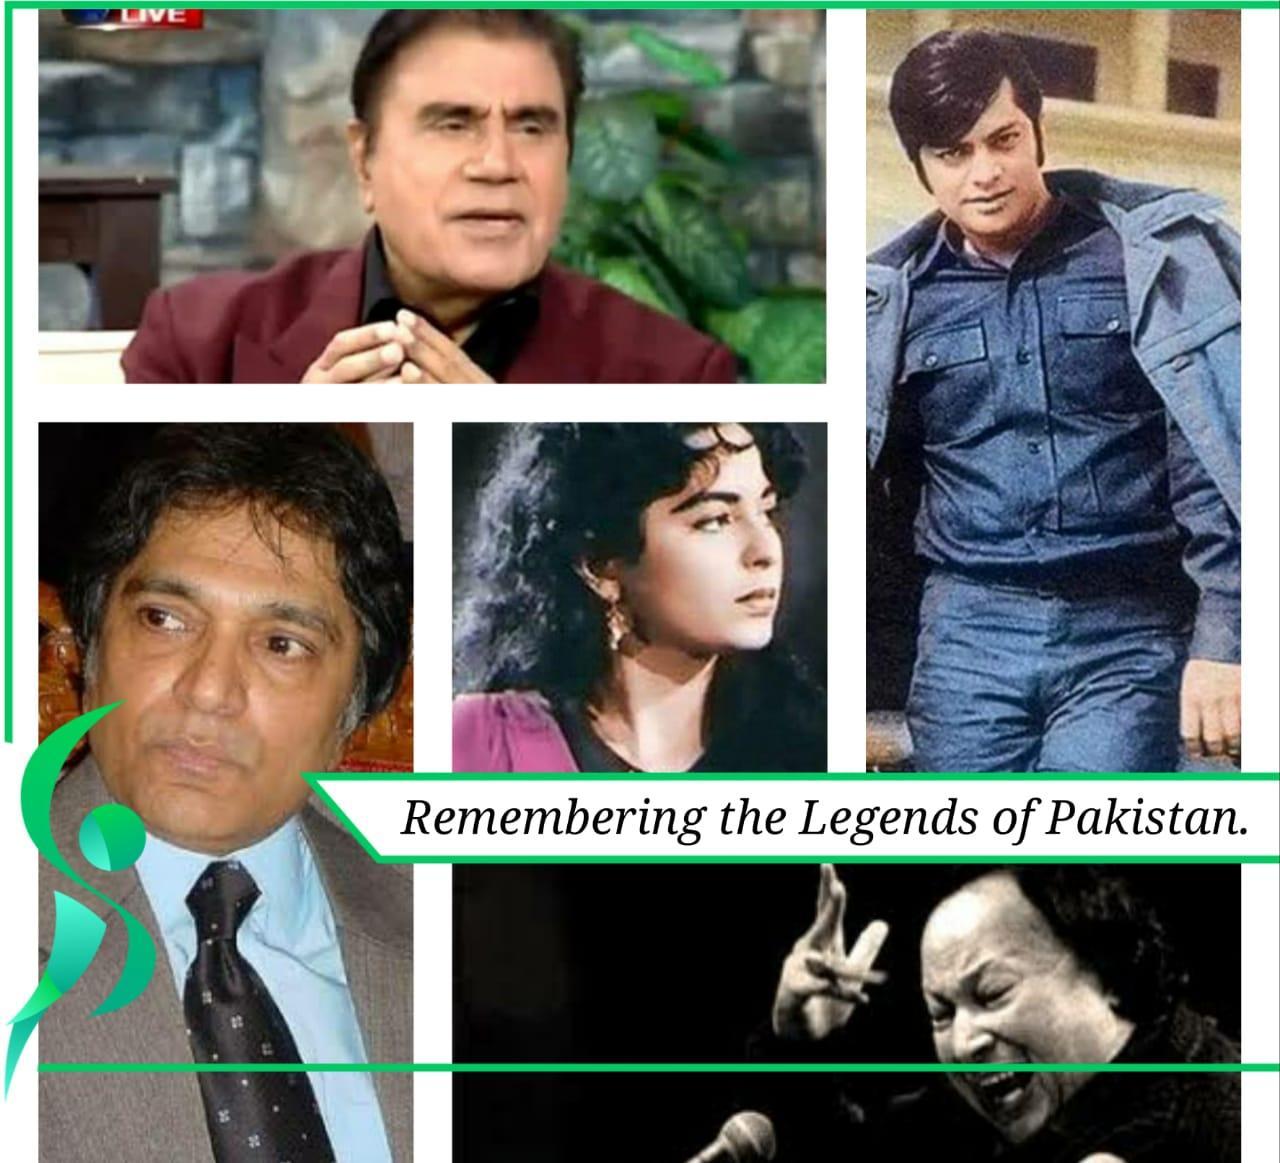 The legends of Pakistan